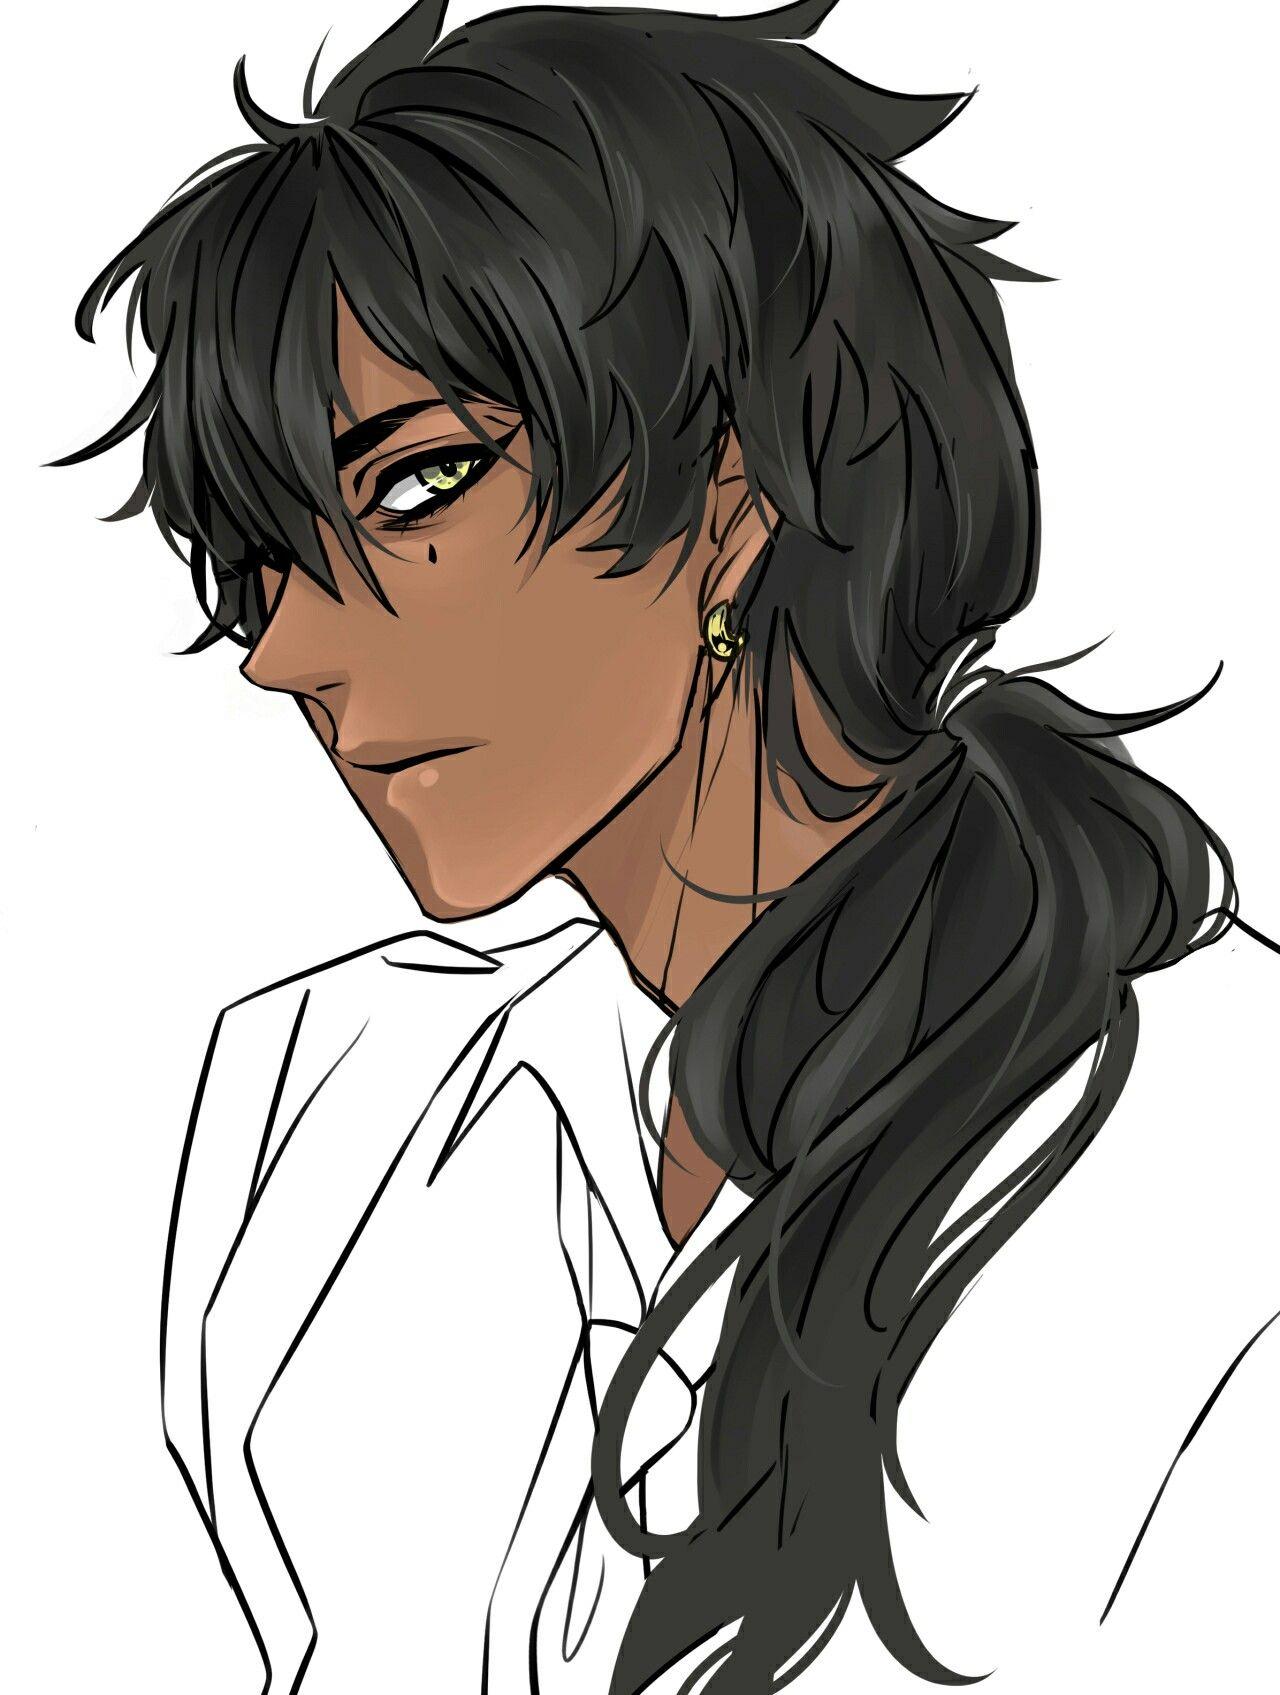 Tyki Mikk D Gray Man Dark Skin Boys Black Anime Characters